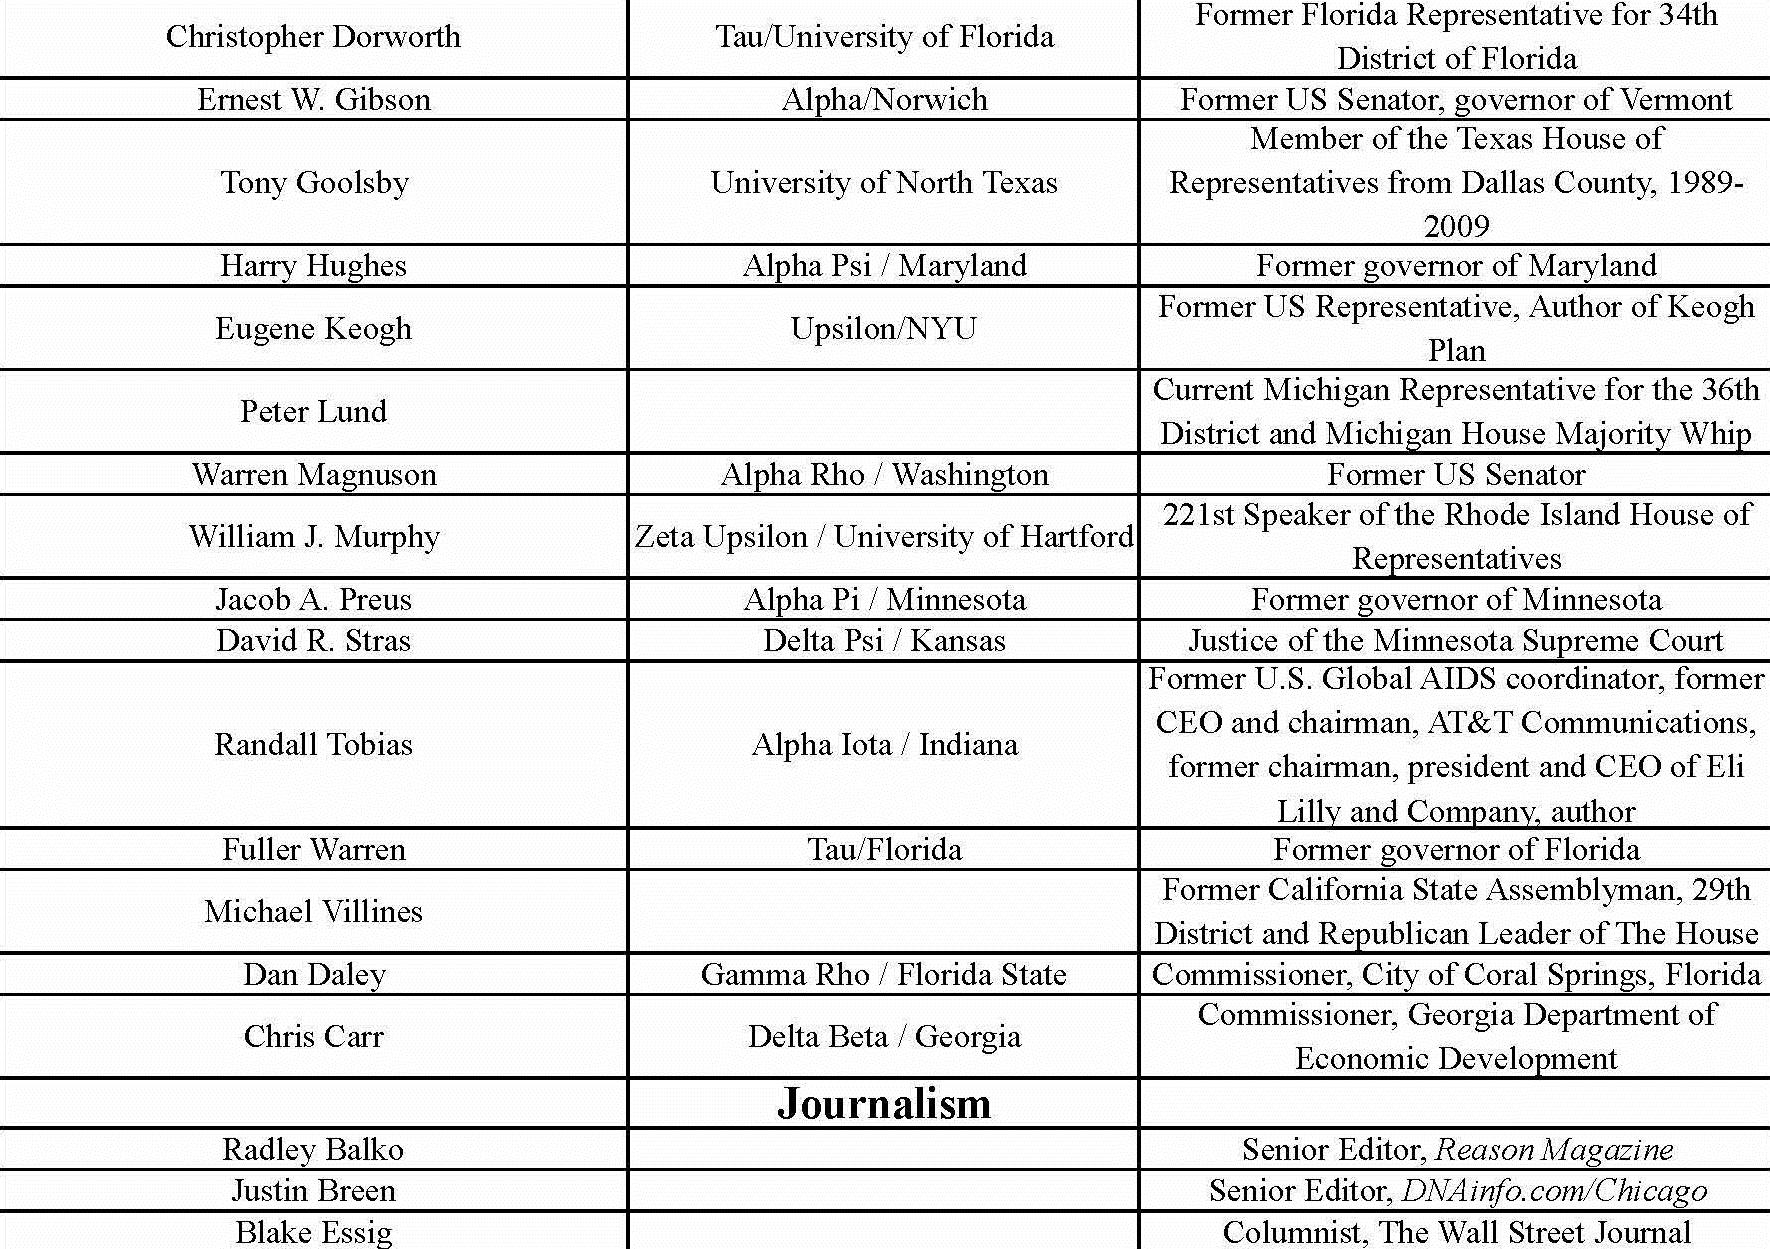 Notable Alumni_Page_6.jpg